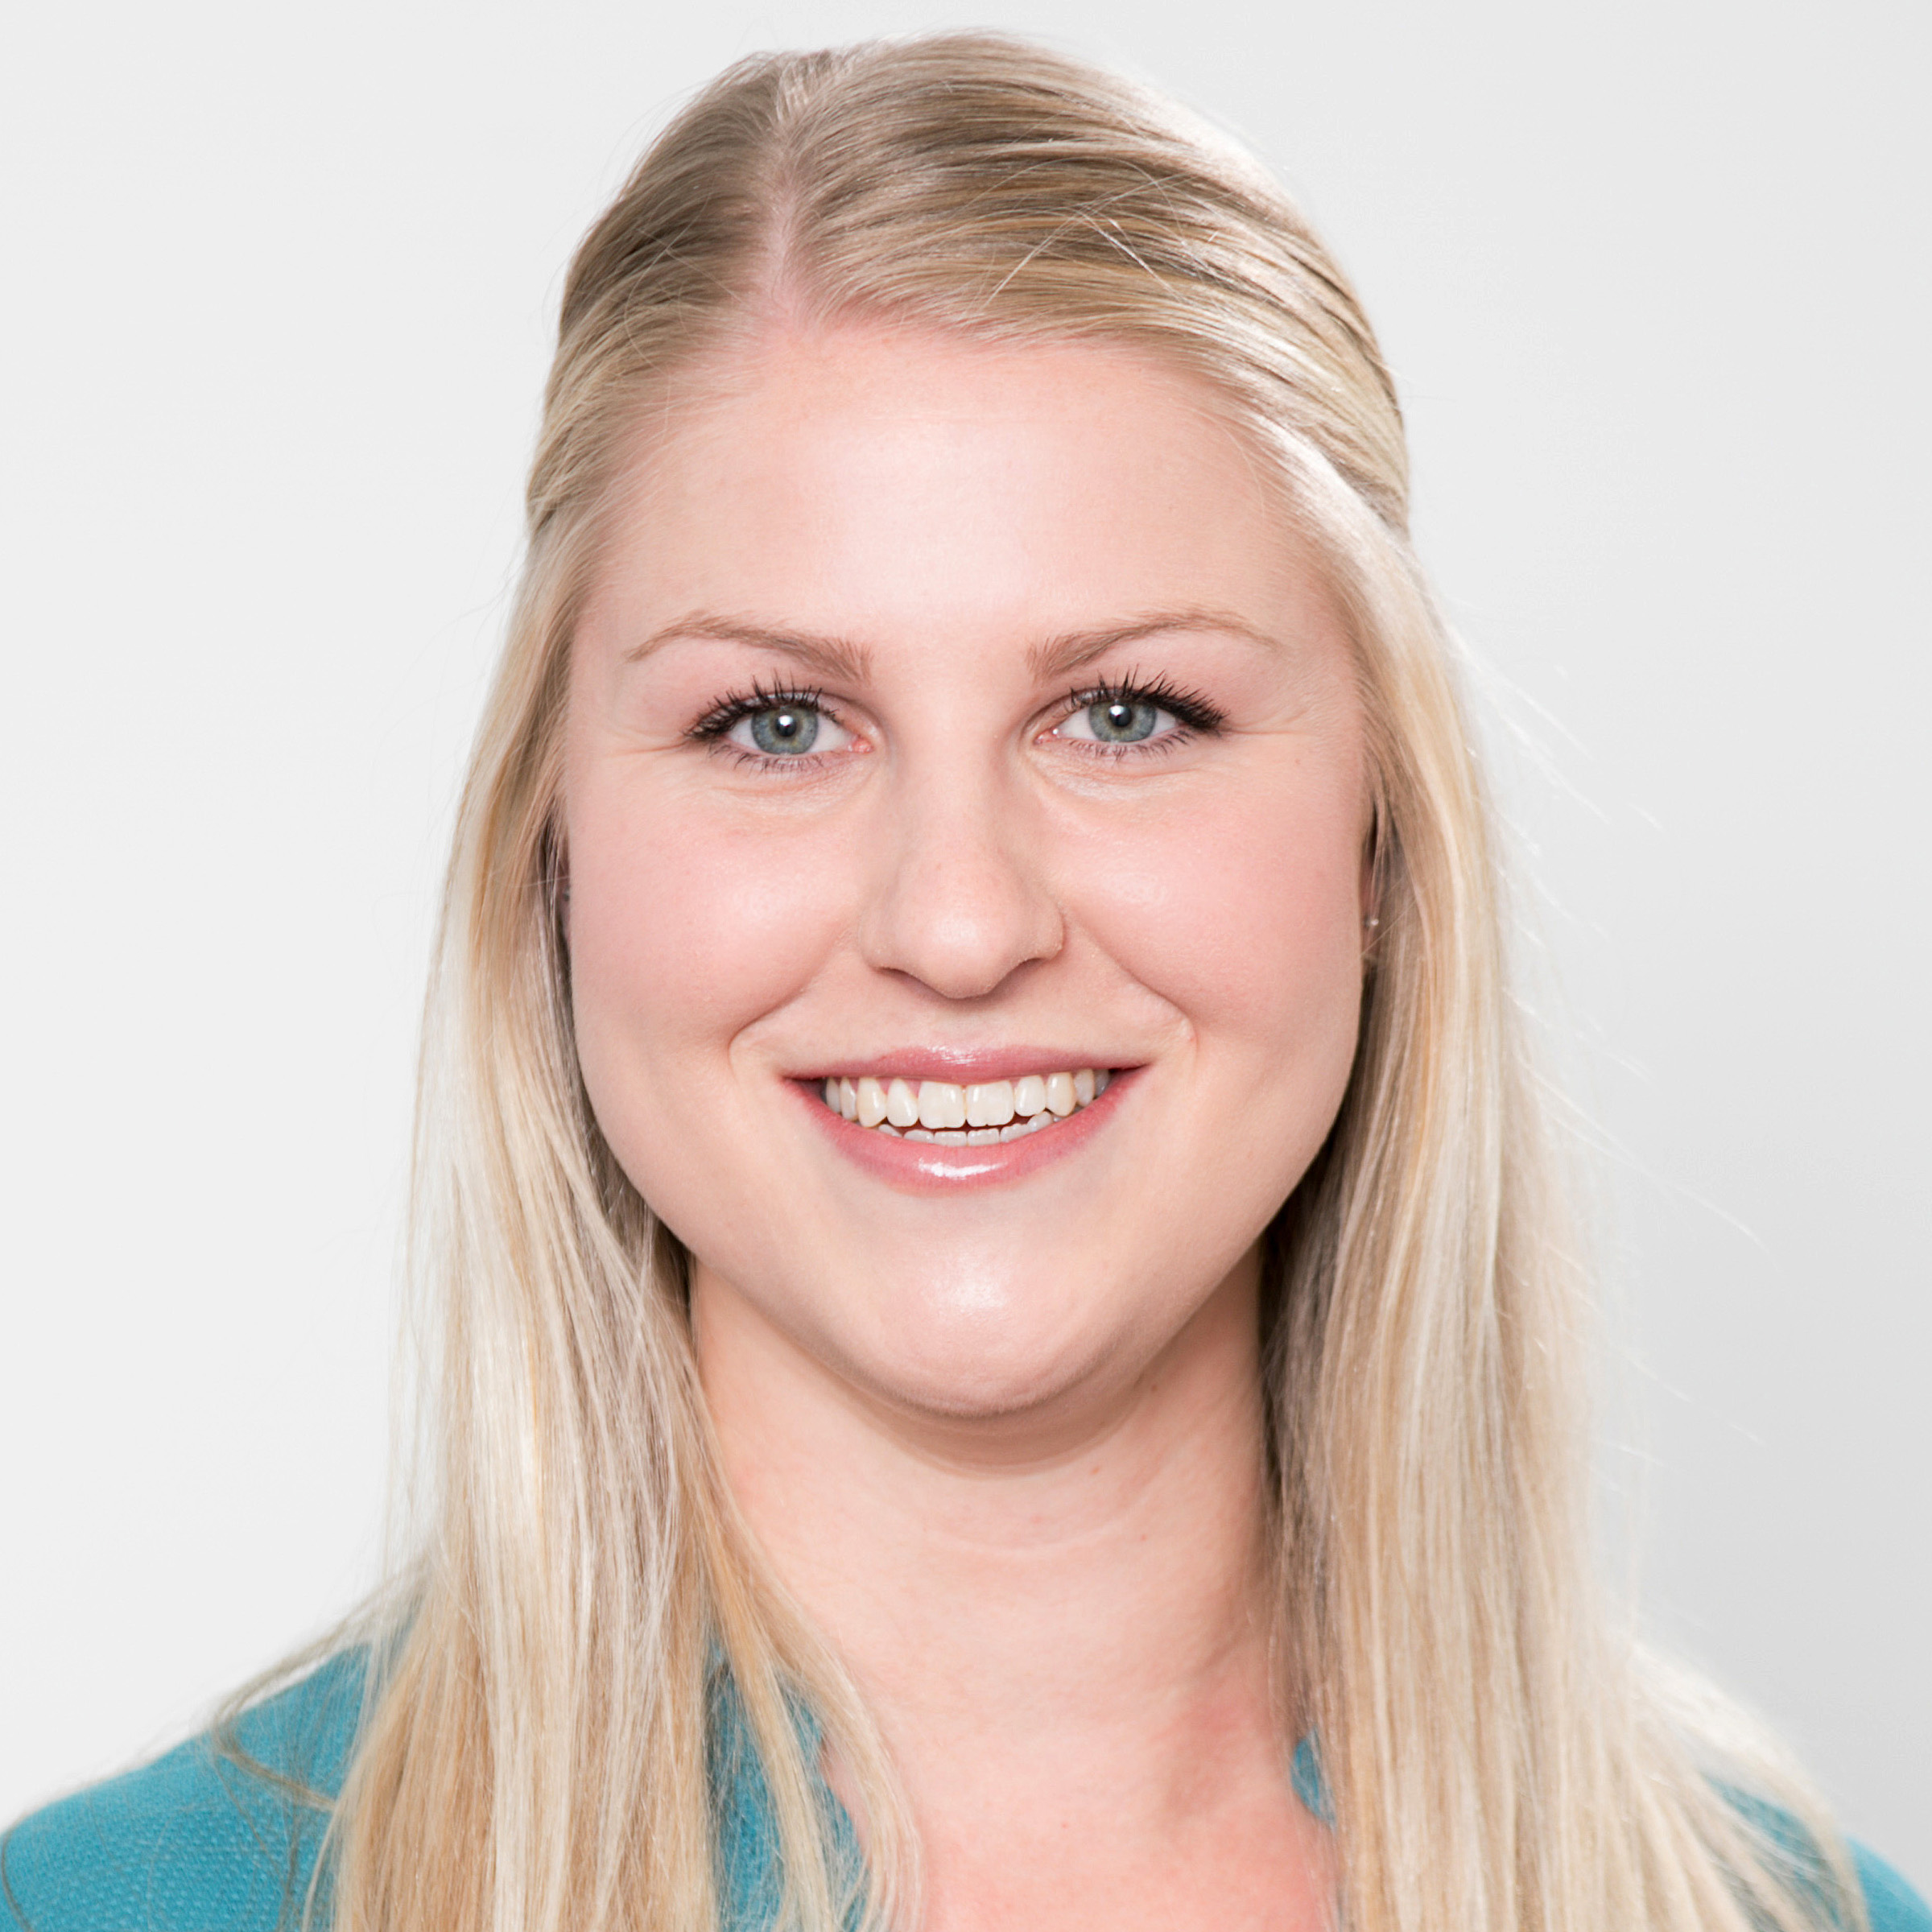 Mayke van der Boon Prodeba zorgprofessional